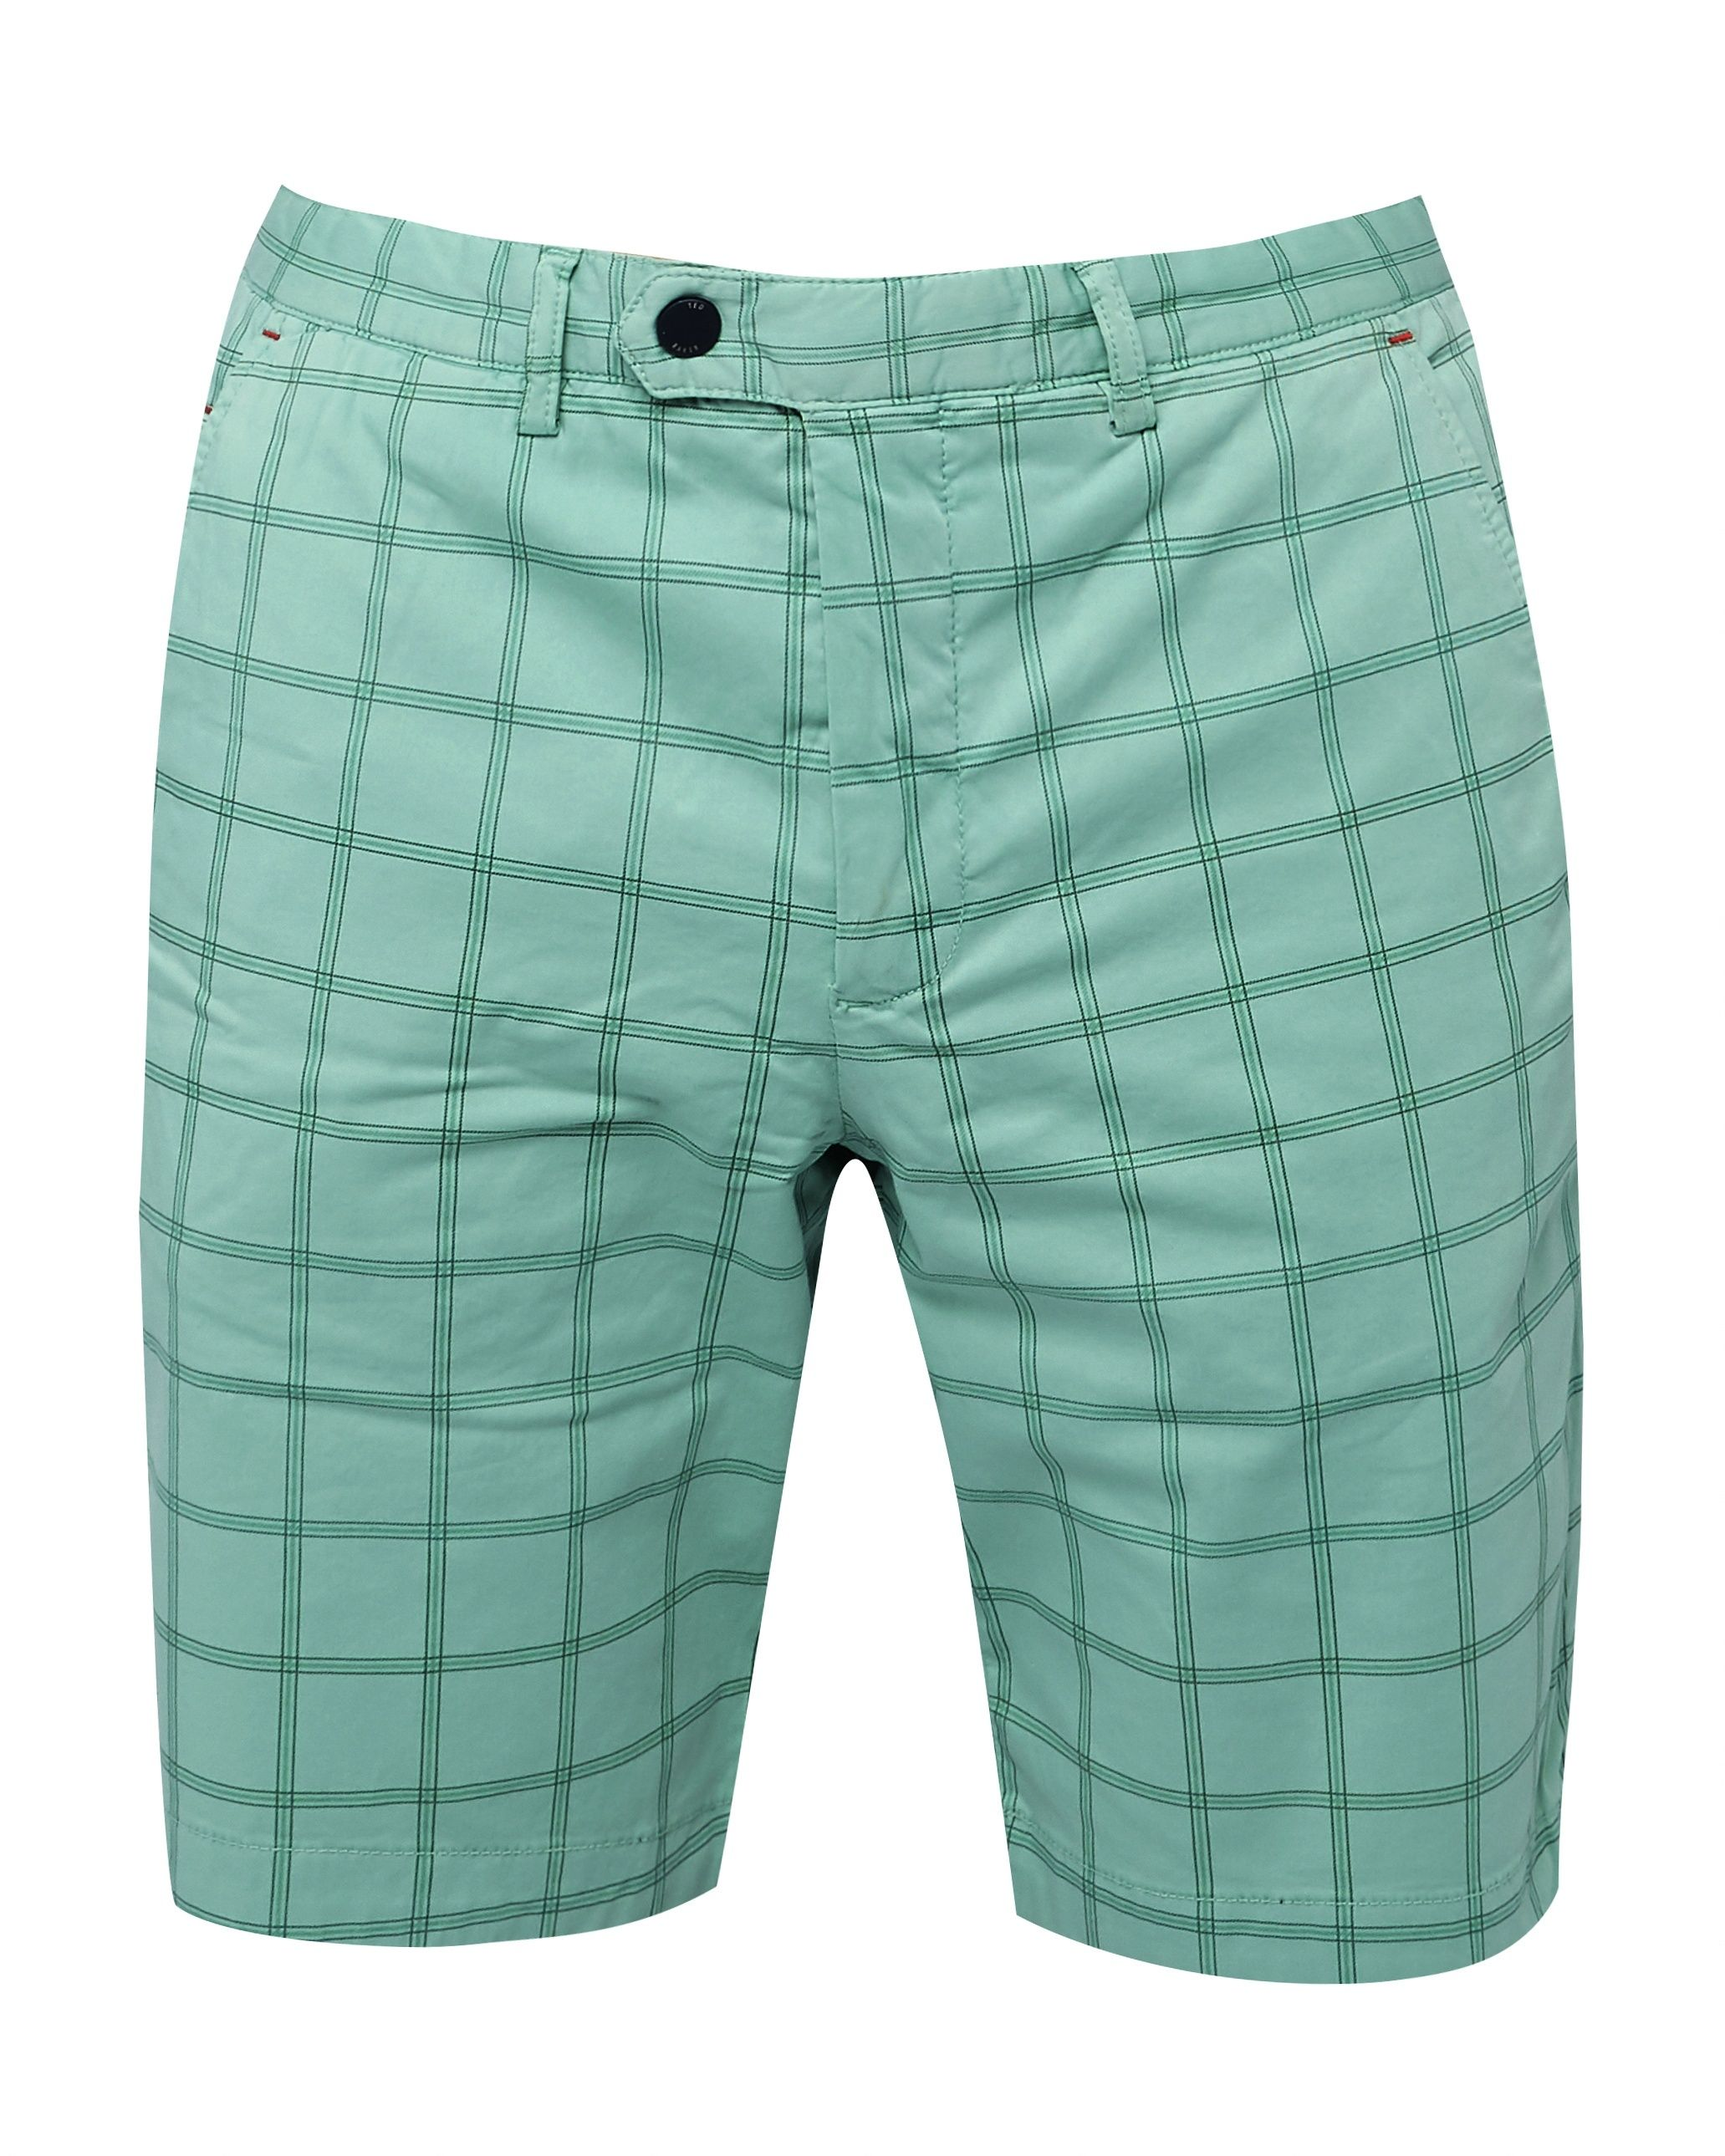 Ted Baker Golfshr Printed Golf Chino Shorts, Green